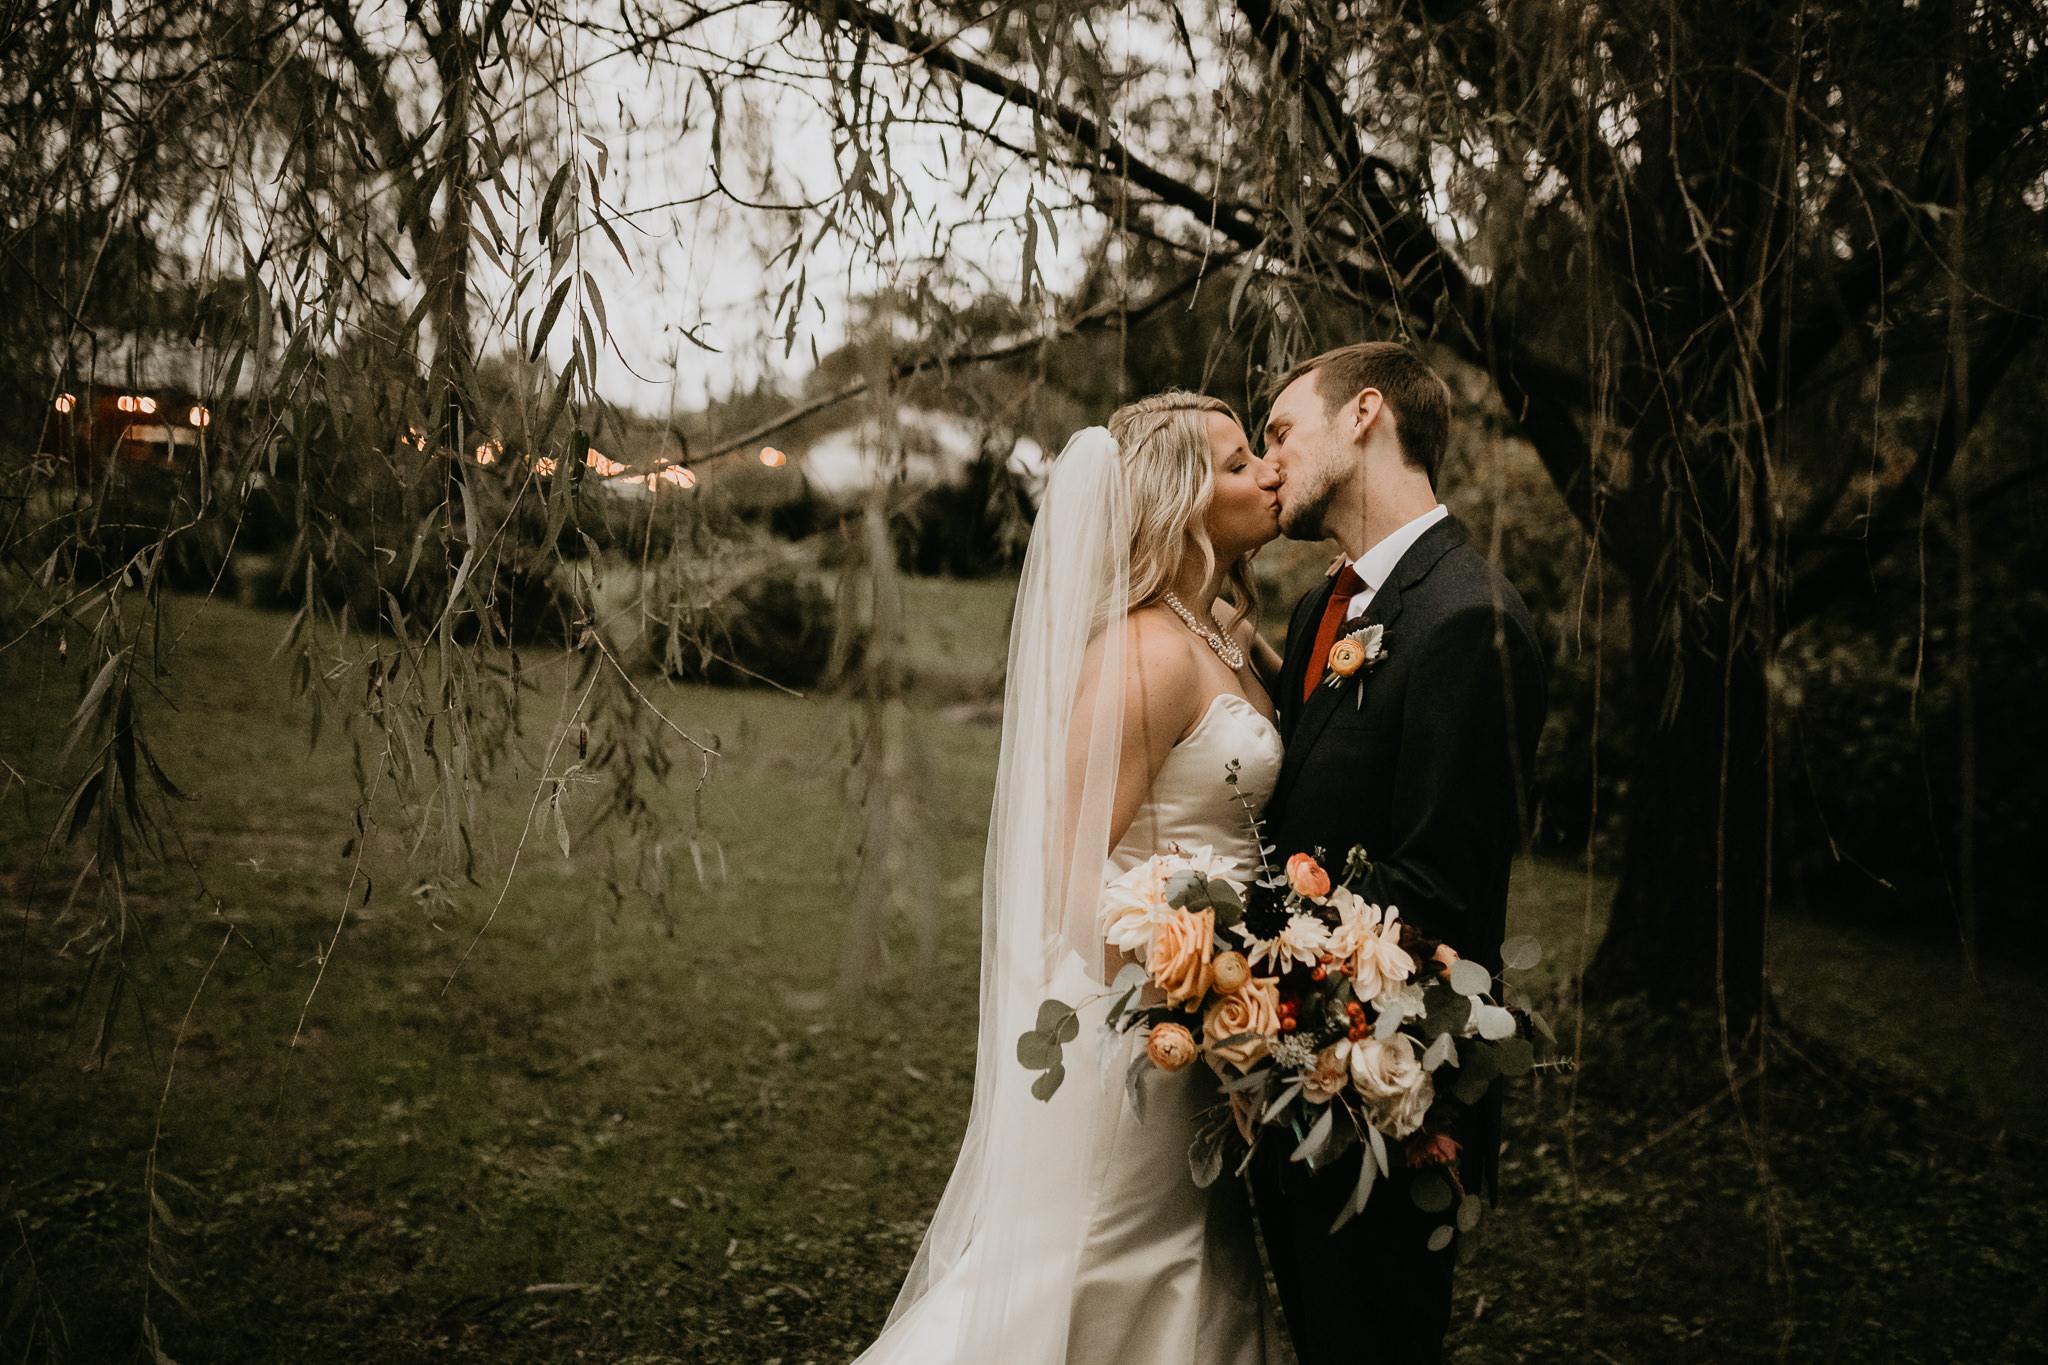 Sundara - Weddings - Virginia - Best Wedding Photographer - Pat Cori Photography-73.jpg